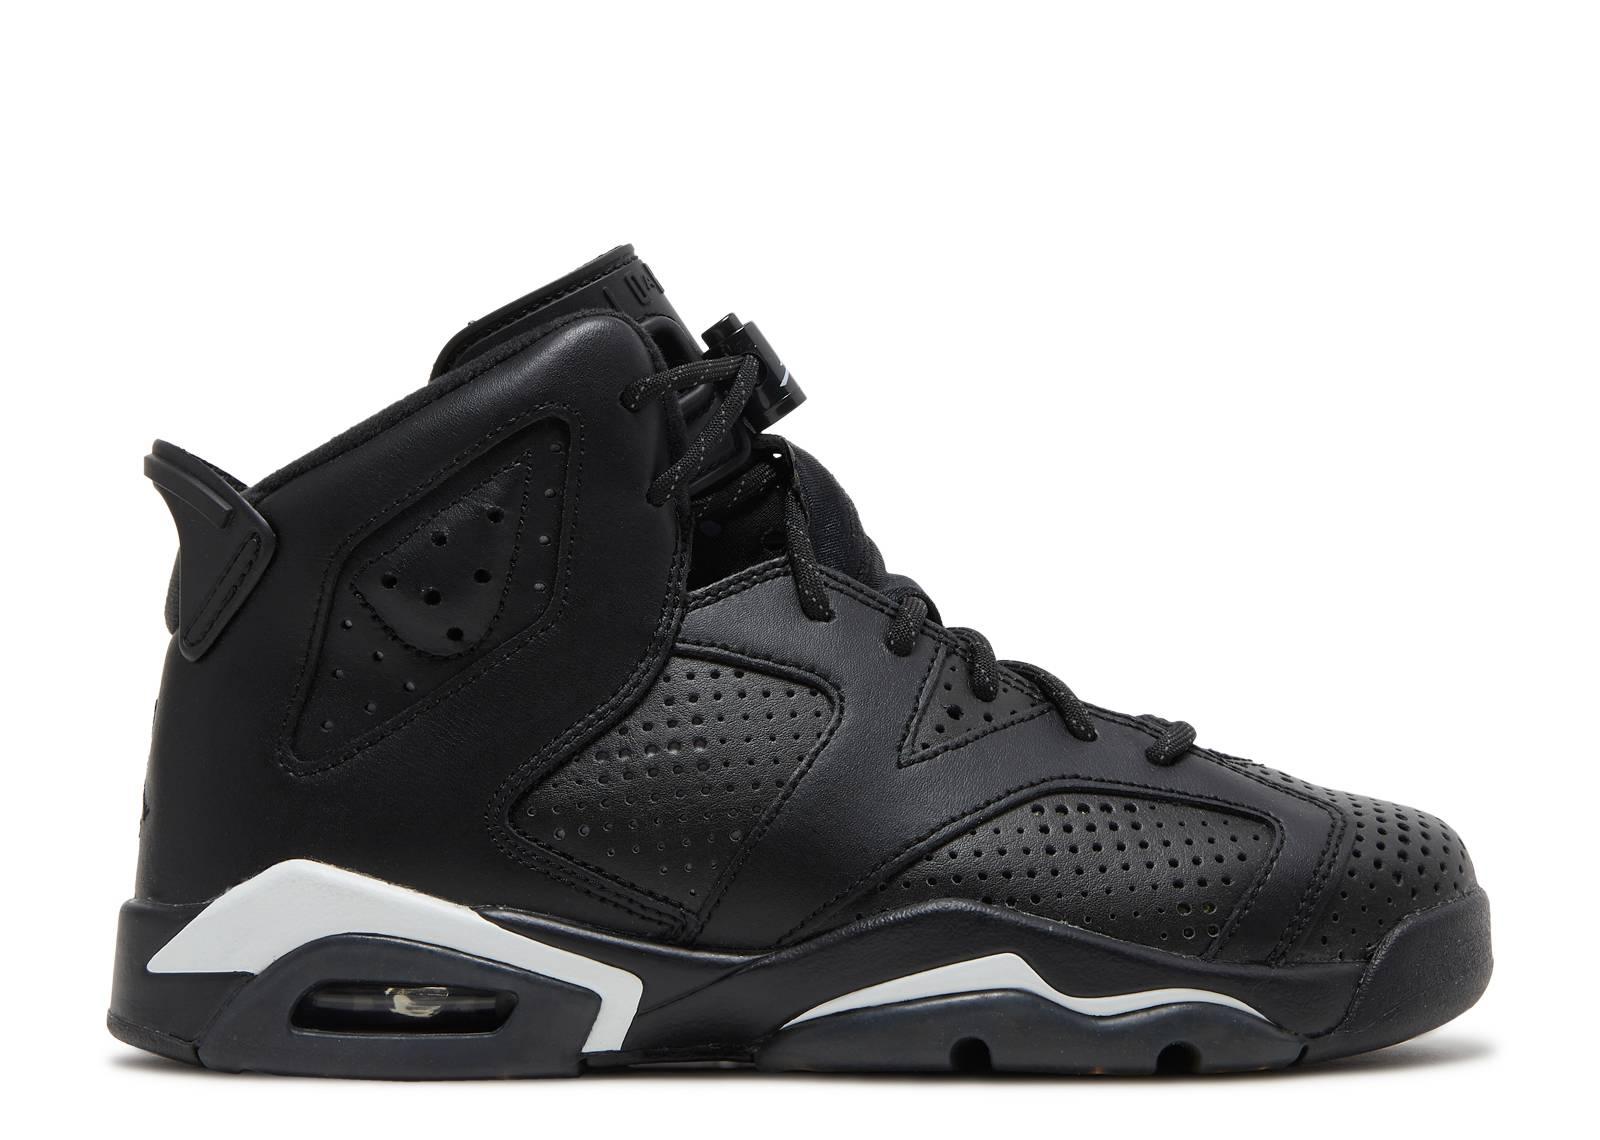 Nike Air Jordan Retro 6 Carreaux Noir Et Blanc